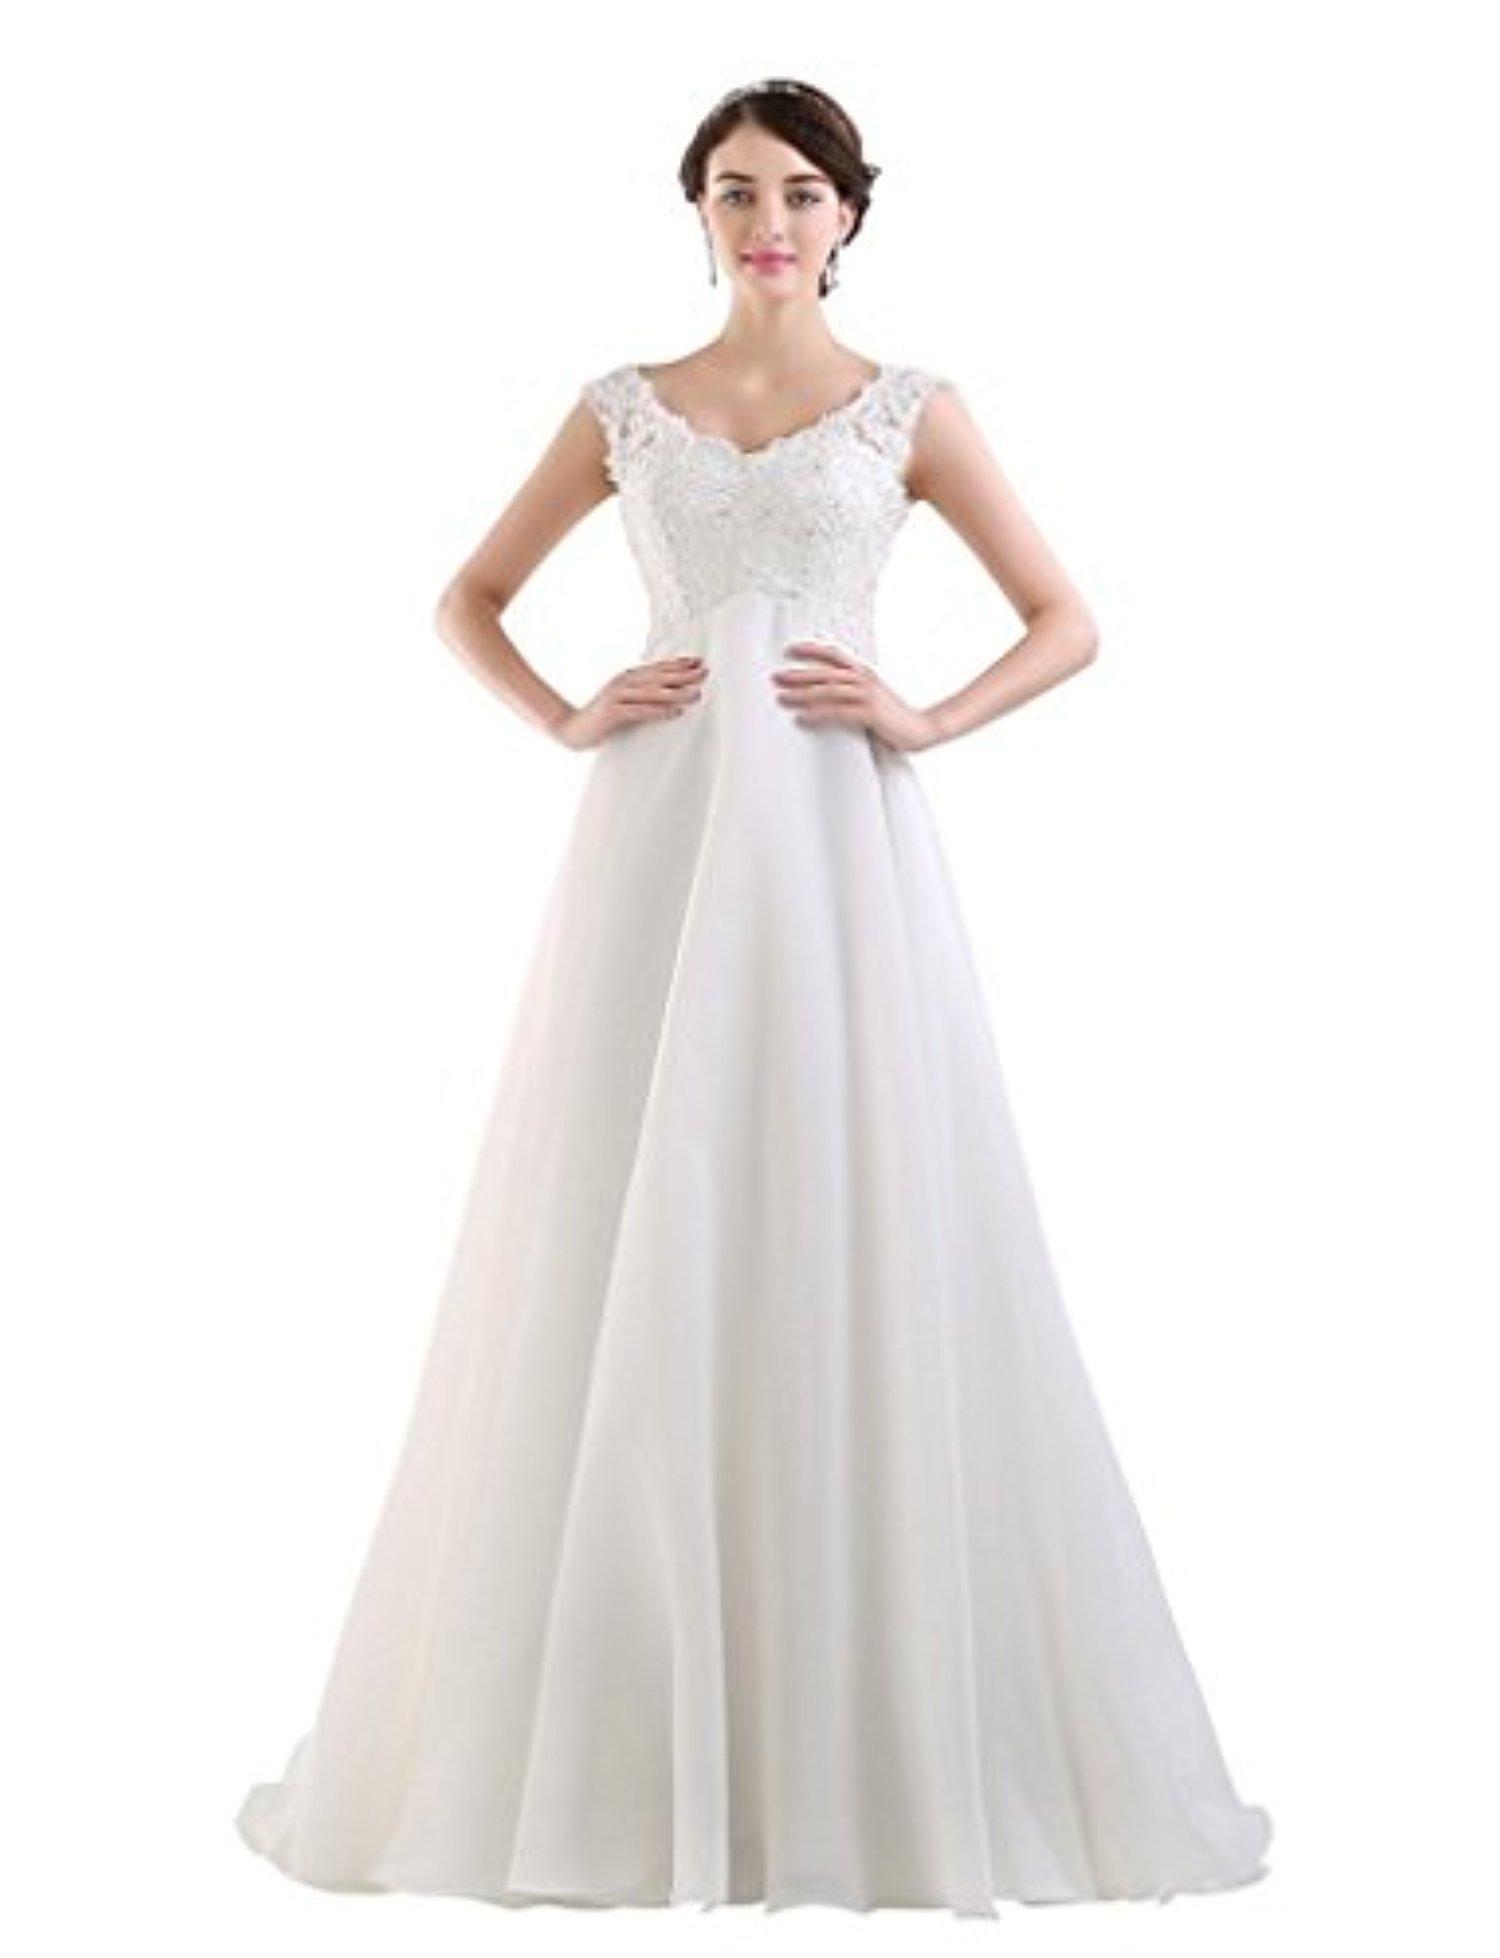 JoyVany Wedding Dress with Detachable Back Cowl 2016 Beach Chiffon Wedidng Gown White Size 6